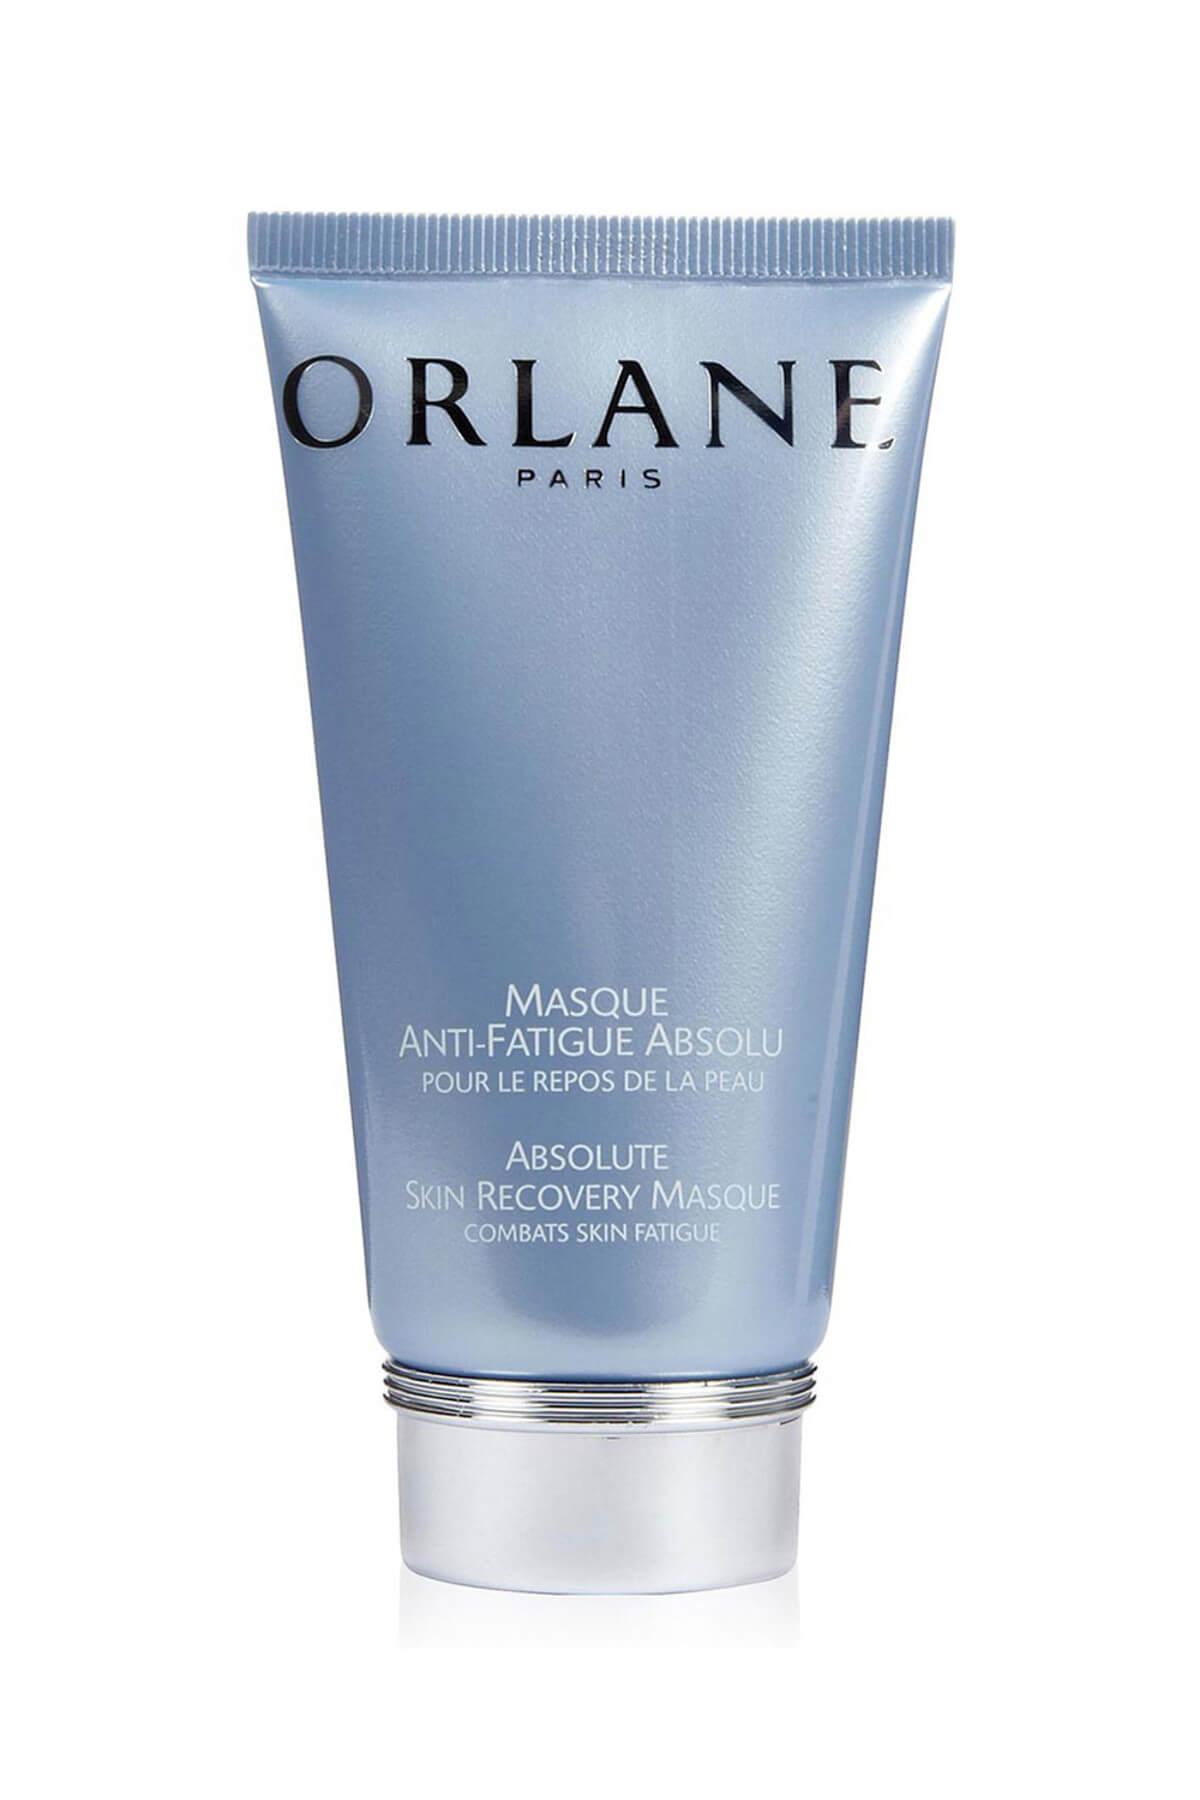 Orlane Onarıcı Maske - Absolute Skin Recovery Masque 75 ml 3359996903008 1